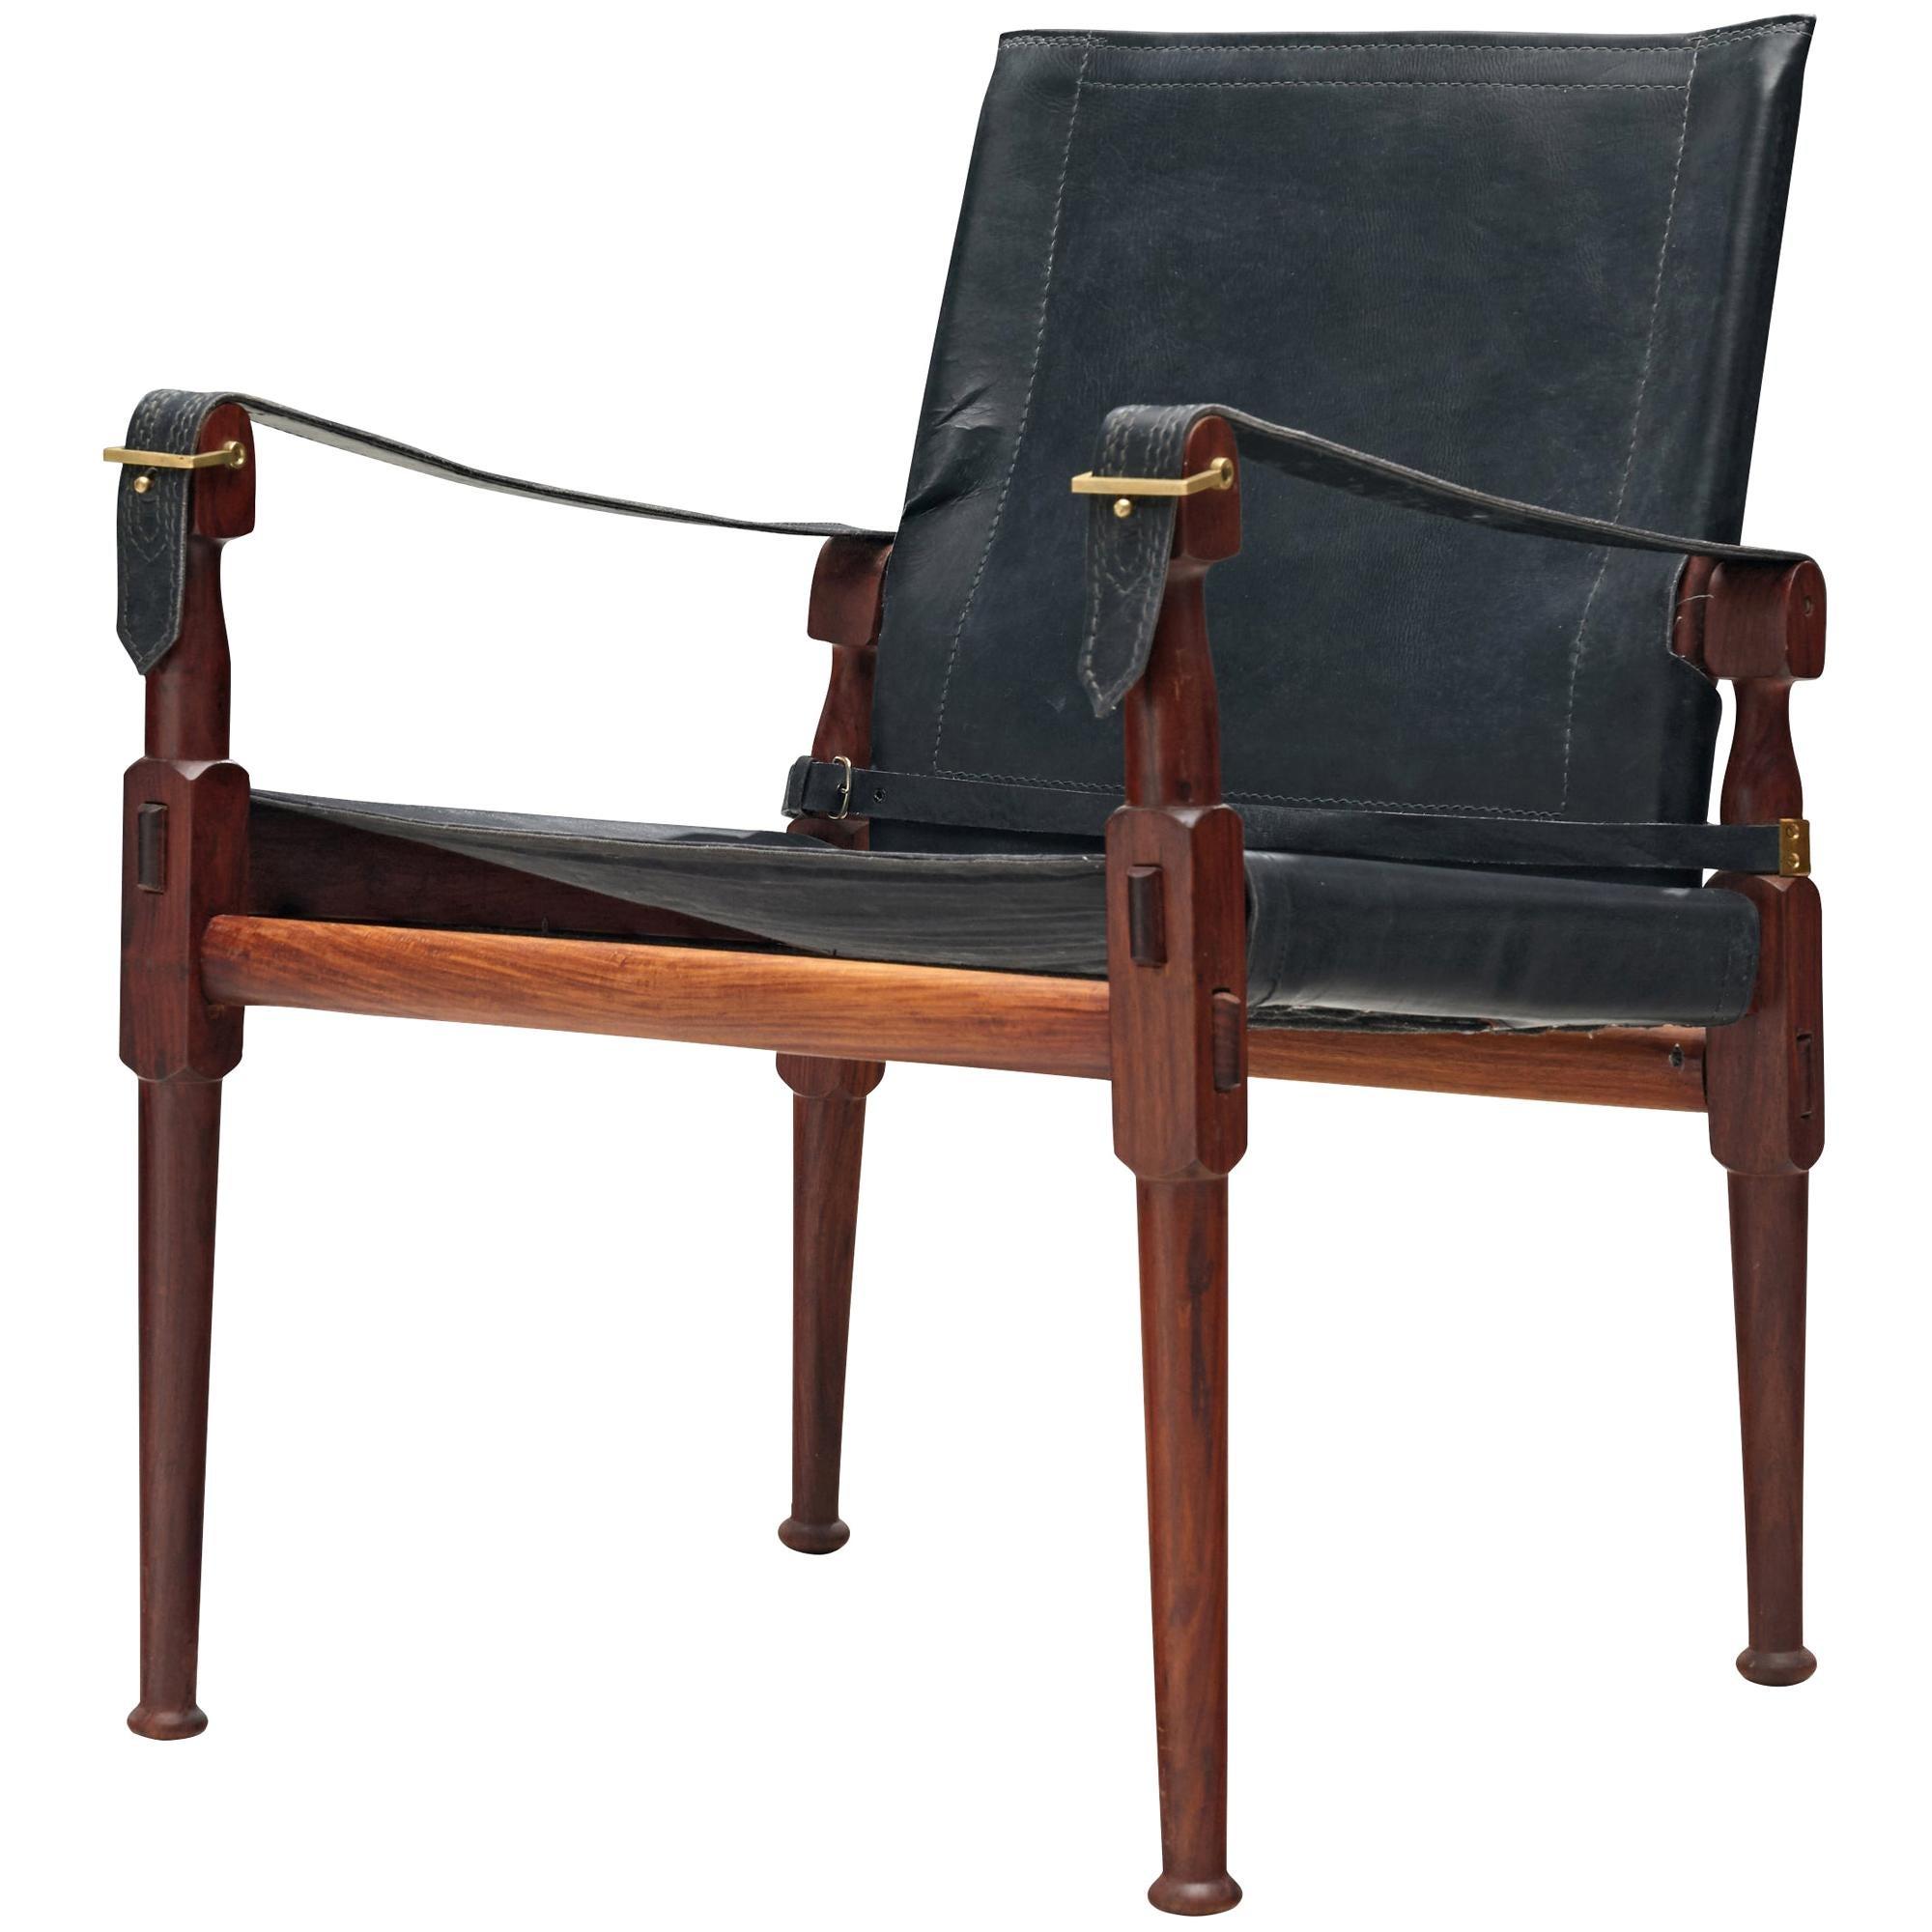 M. Hayat & Brothers Pakistani Safari Chair